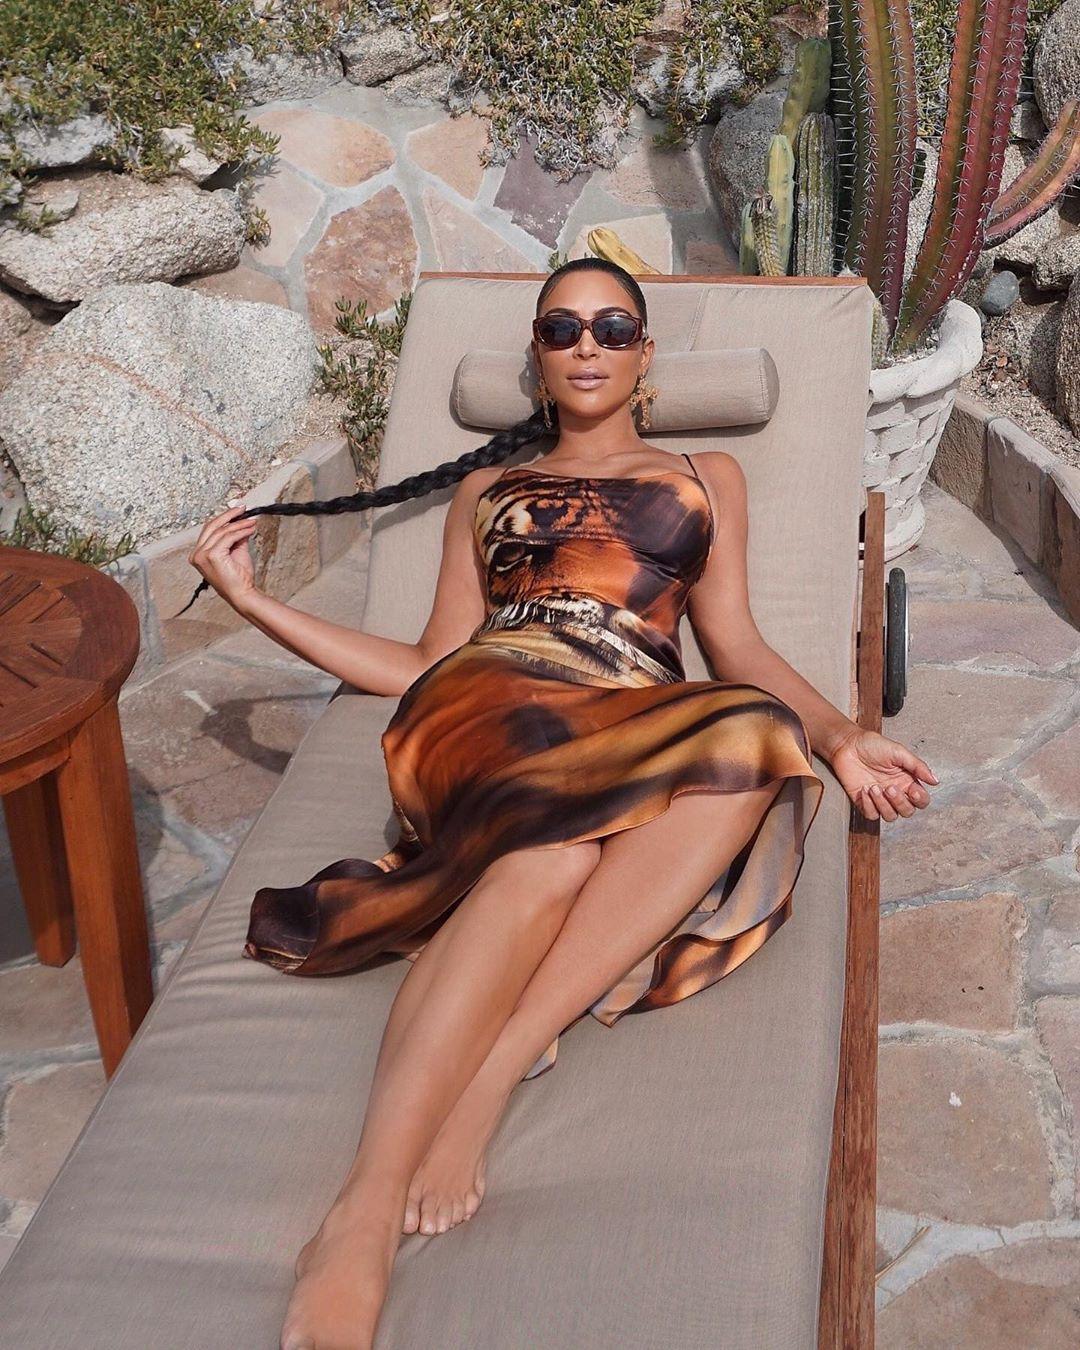 Kim Kardashian wearing a Slinky tan printed maxi dress with a satin fabric, a scoop neck and spaghetti straps